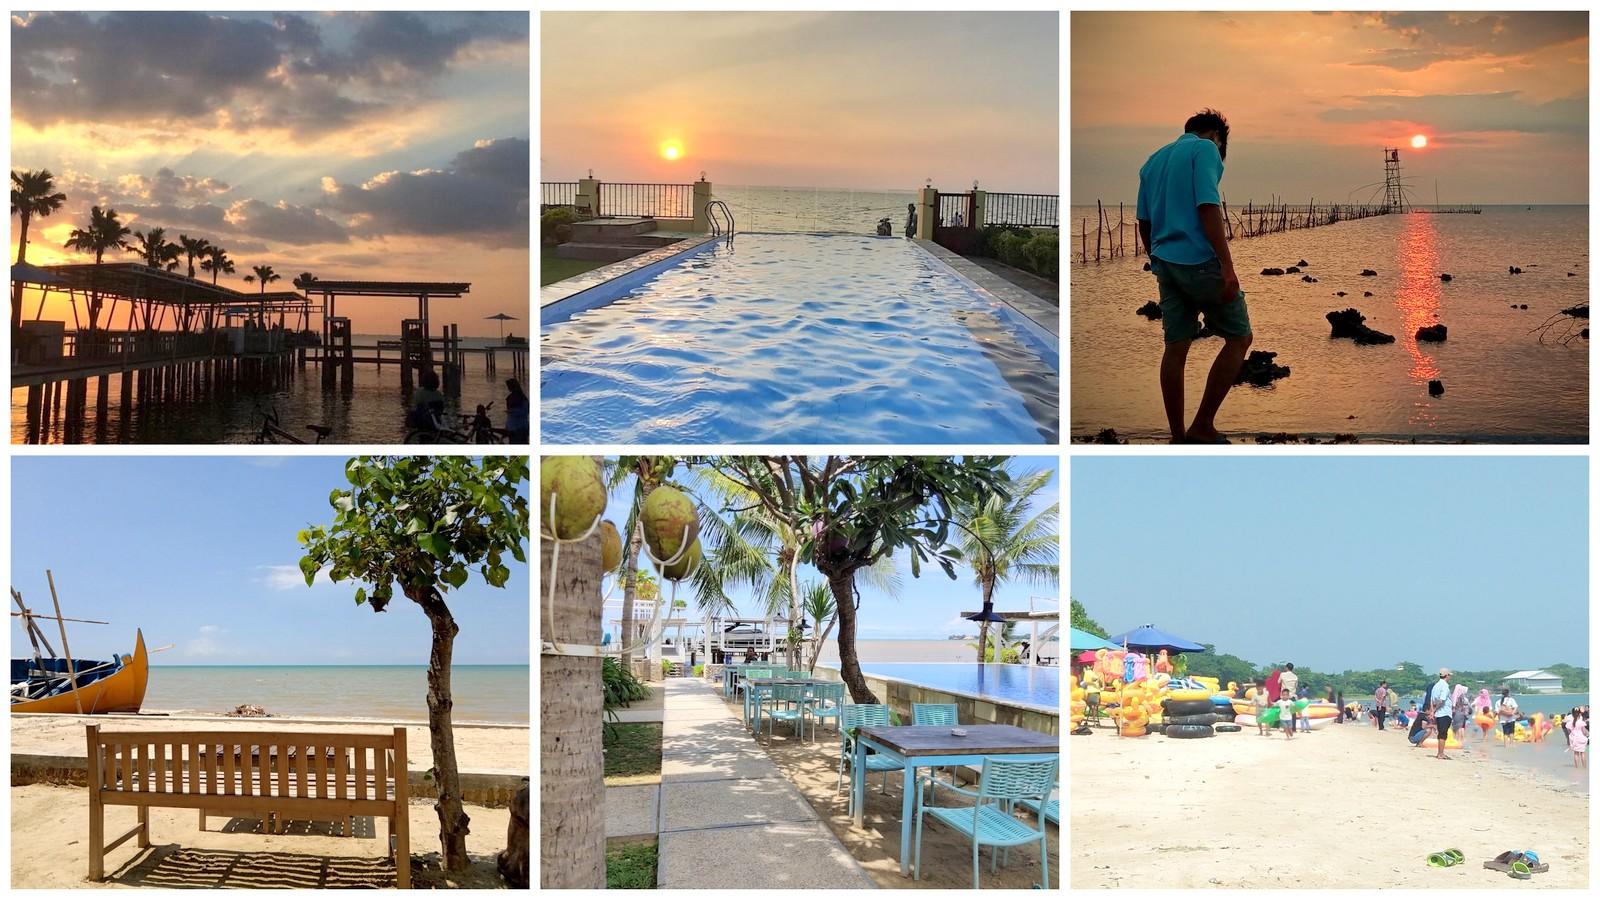 Pantai Teluk Awur Jepara Fasilitas Dan Tiket Masuk 2020 Loket Wisata